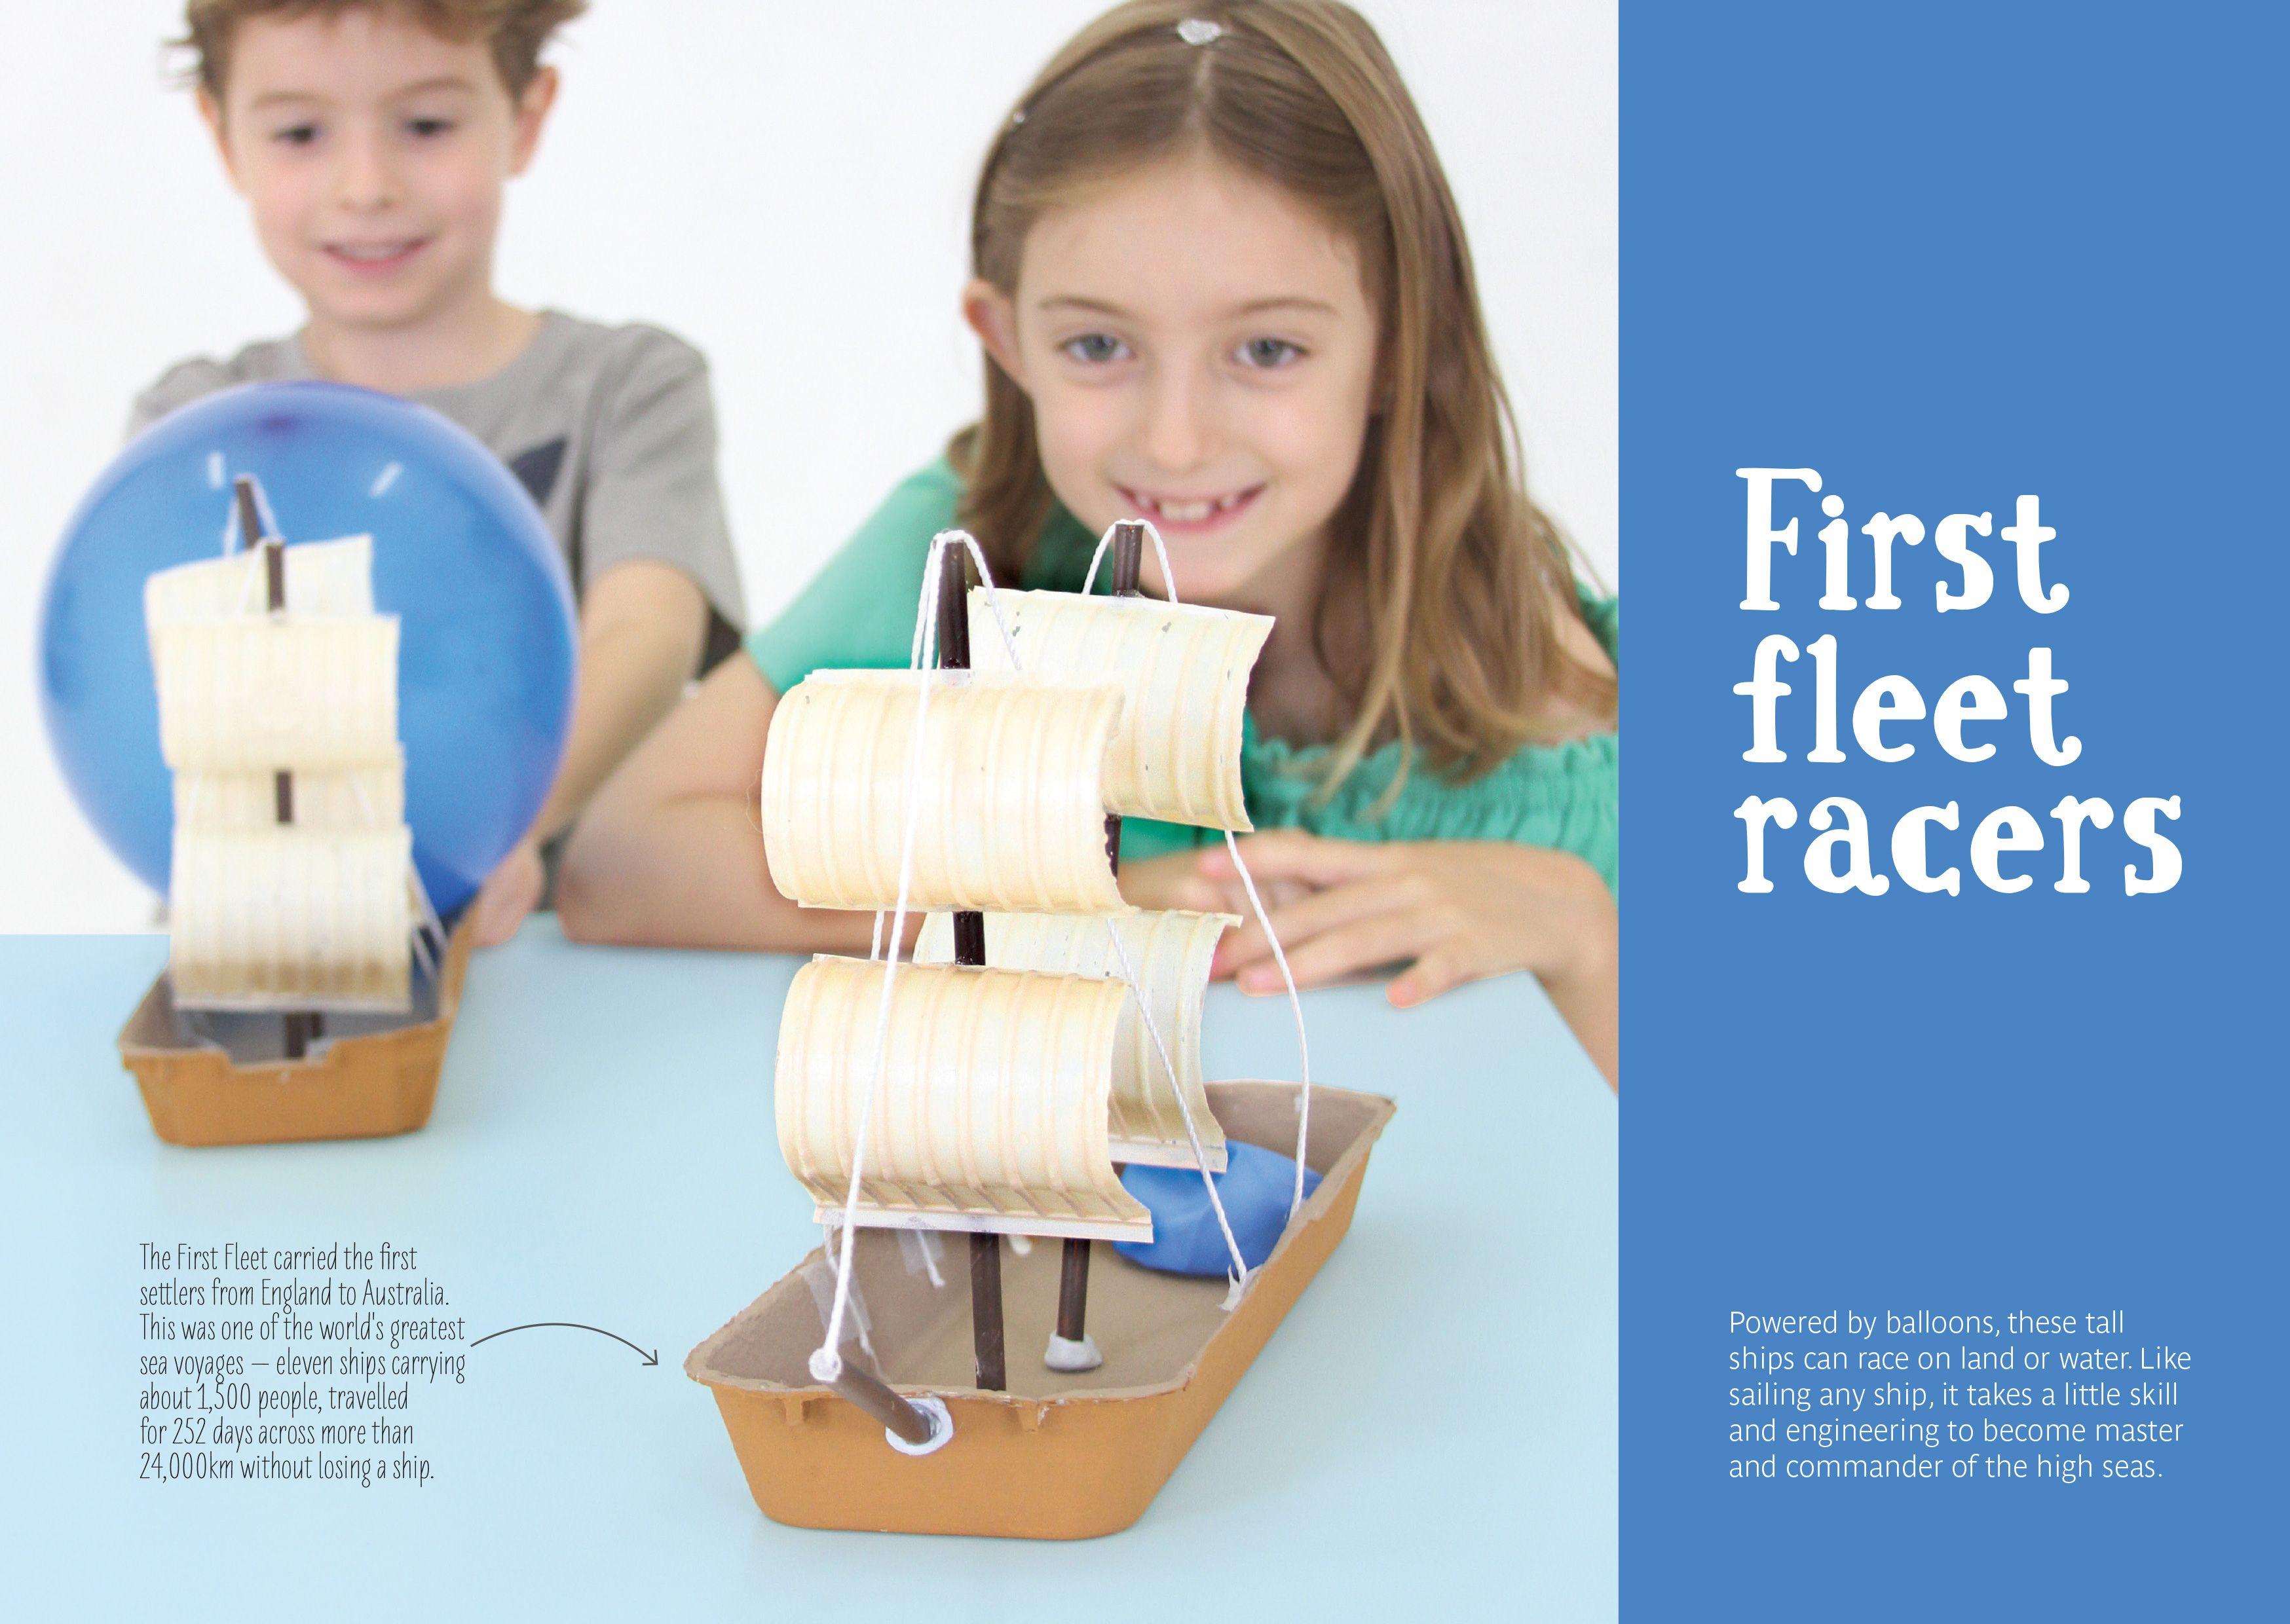 Pin by Brooke on First fleet in 2020 First fleet